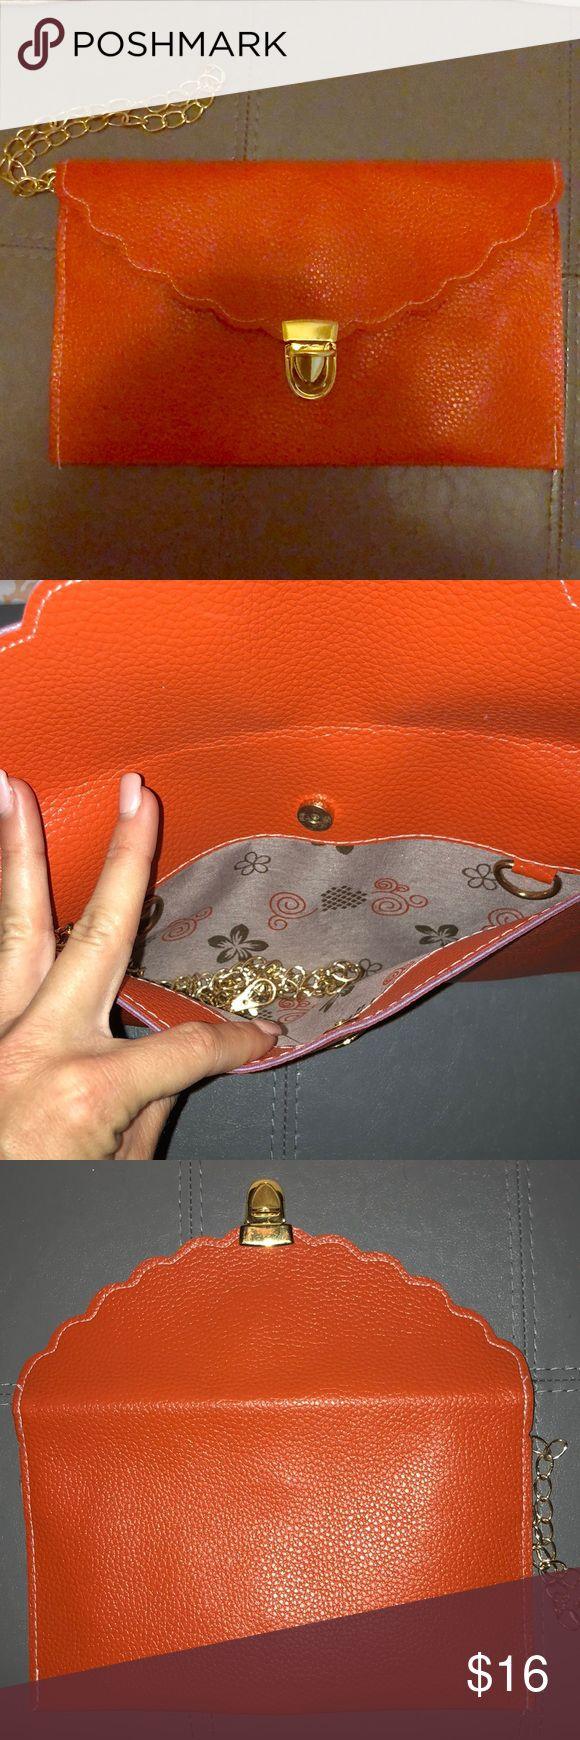 Orange clutch Brand new orange clutch with strap Bags Clutches & Wristlets